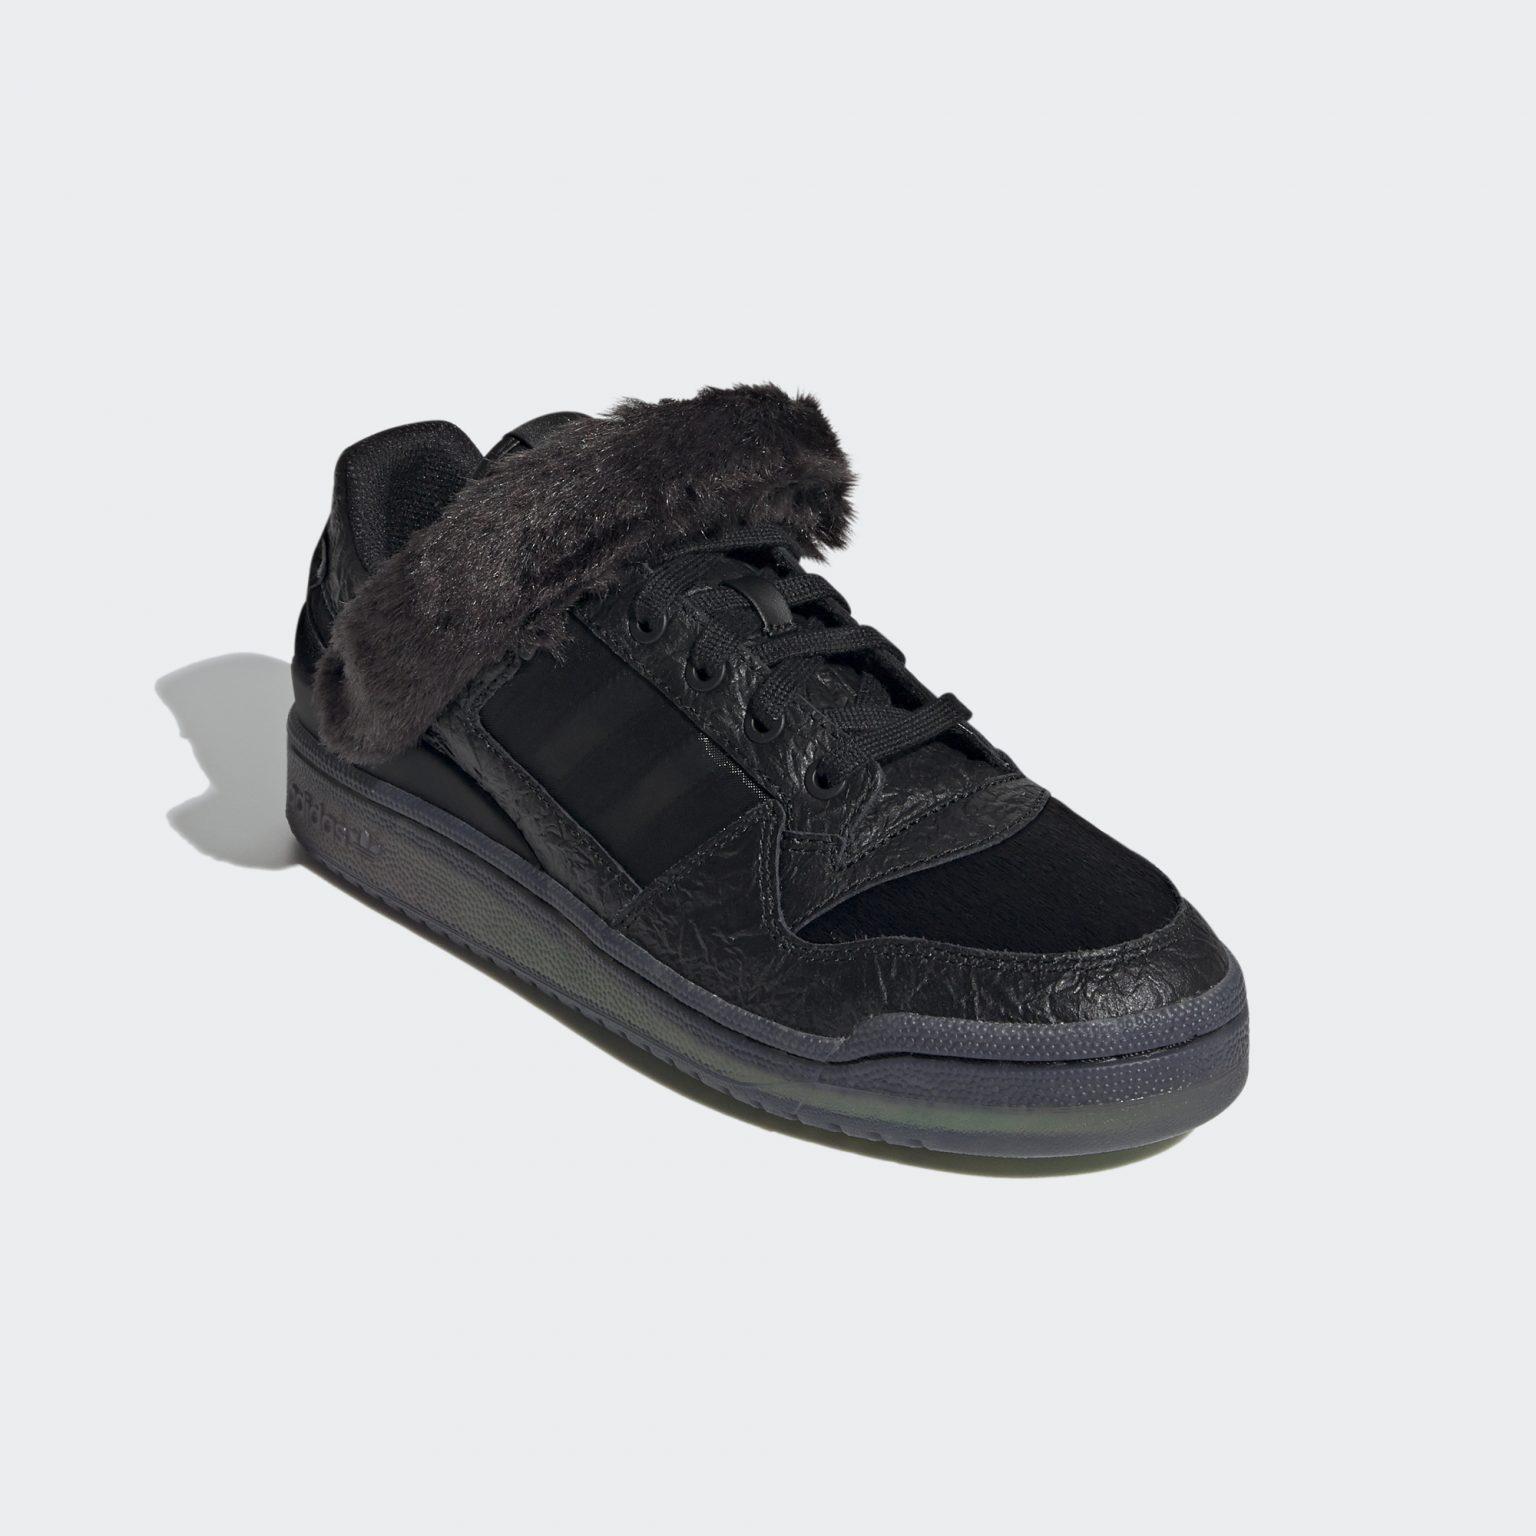 giay the thao hot tu 25-31.10.2020 adidas-halloween-elleman (7)